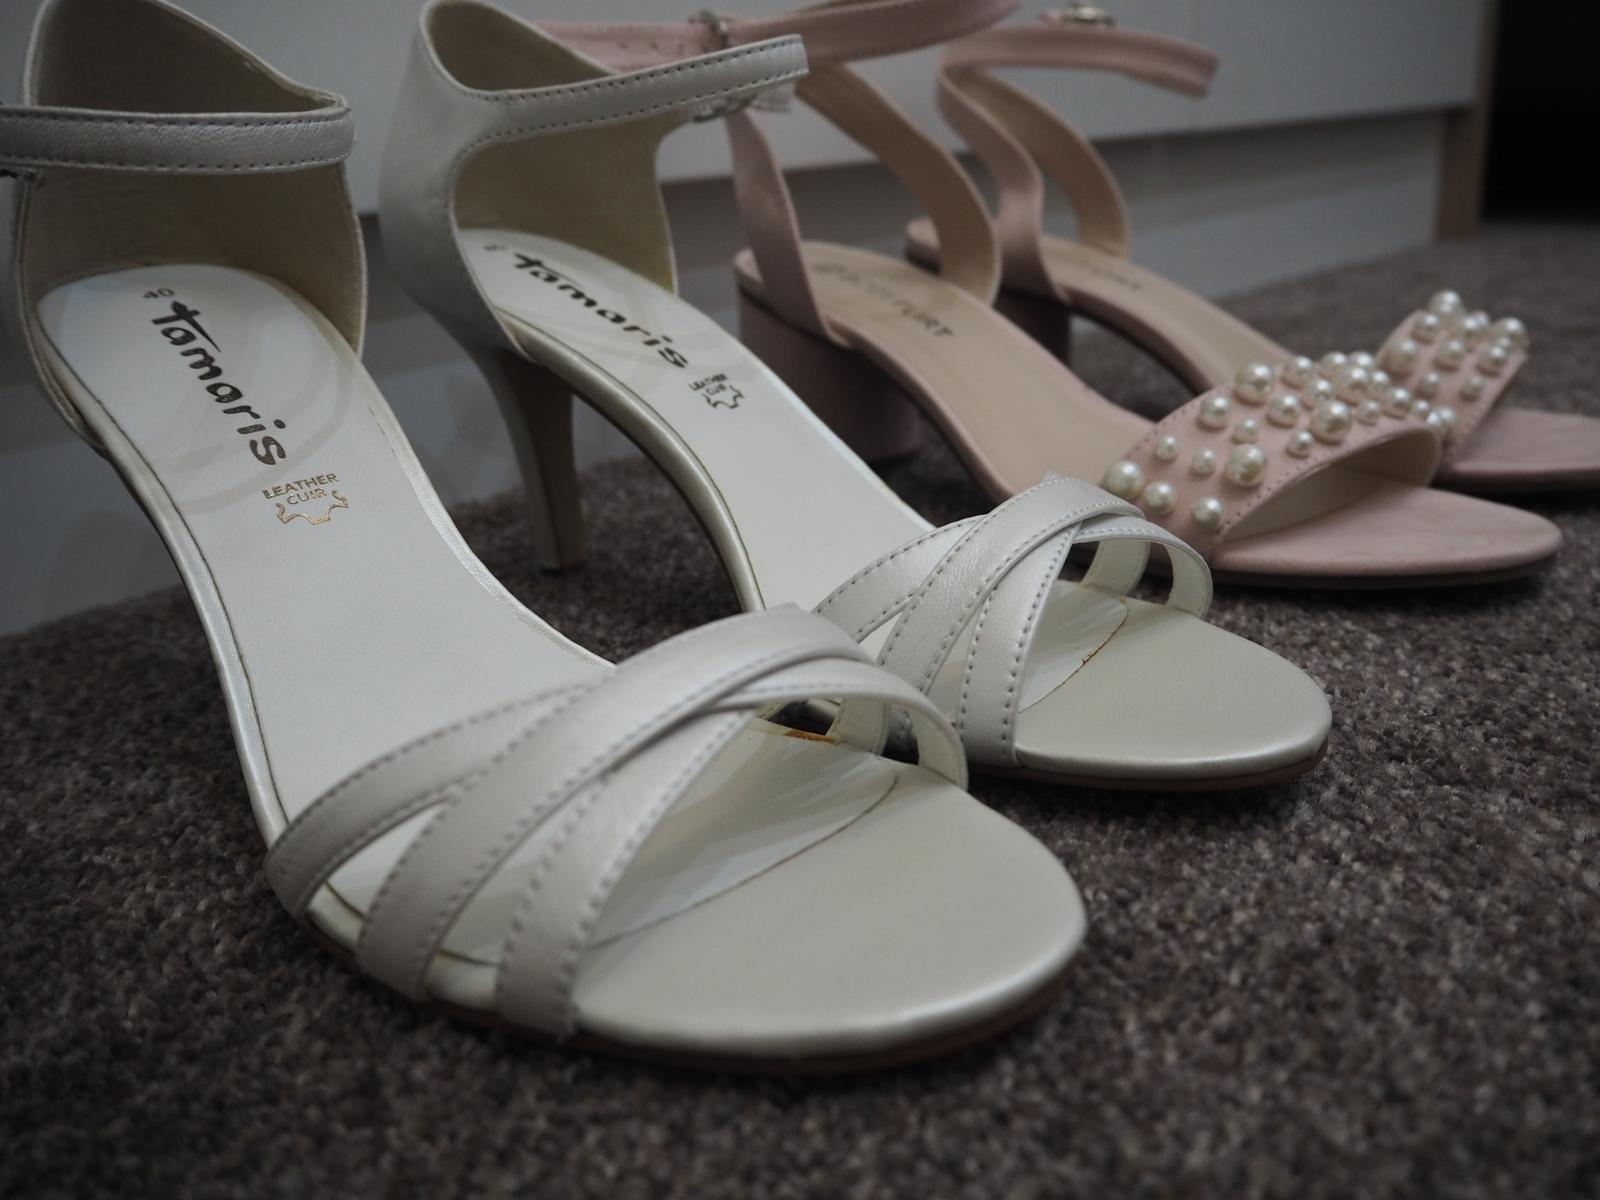 Moje sny ... - Moje topánočky 👠 laby 41ky 😁